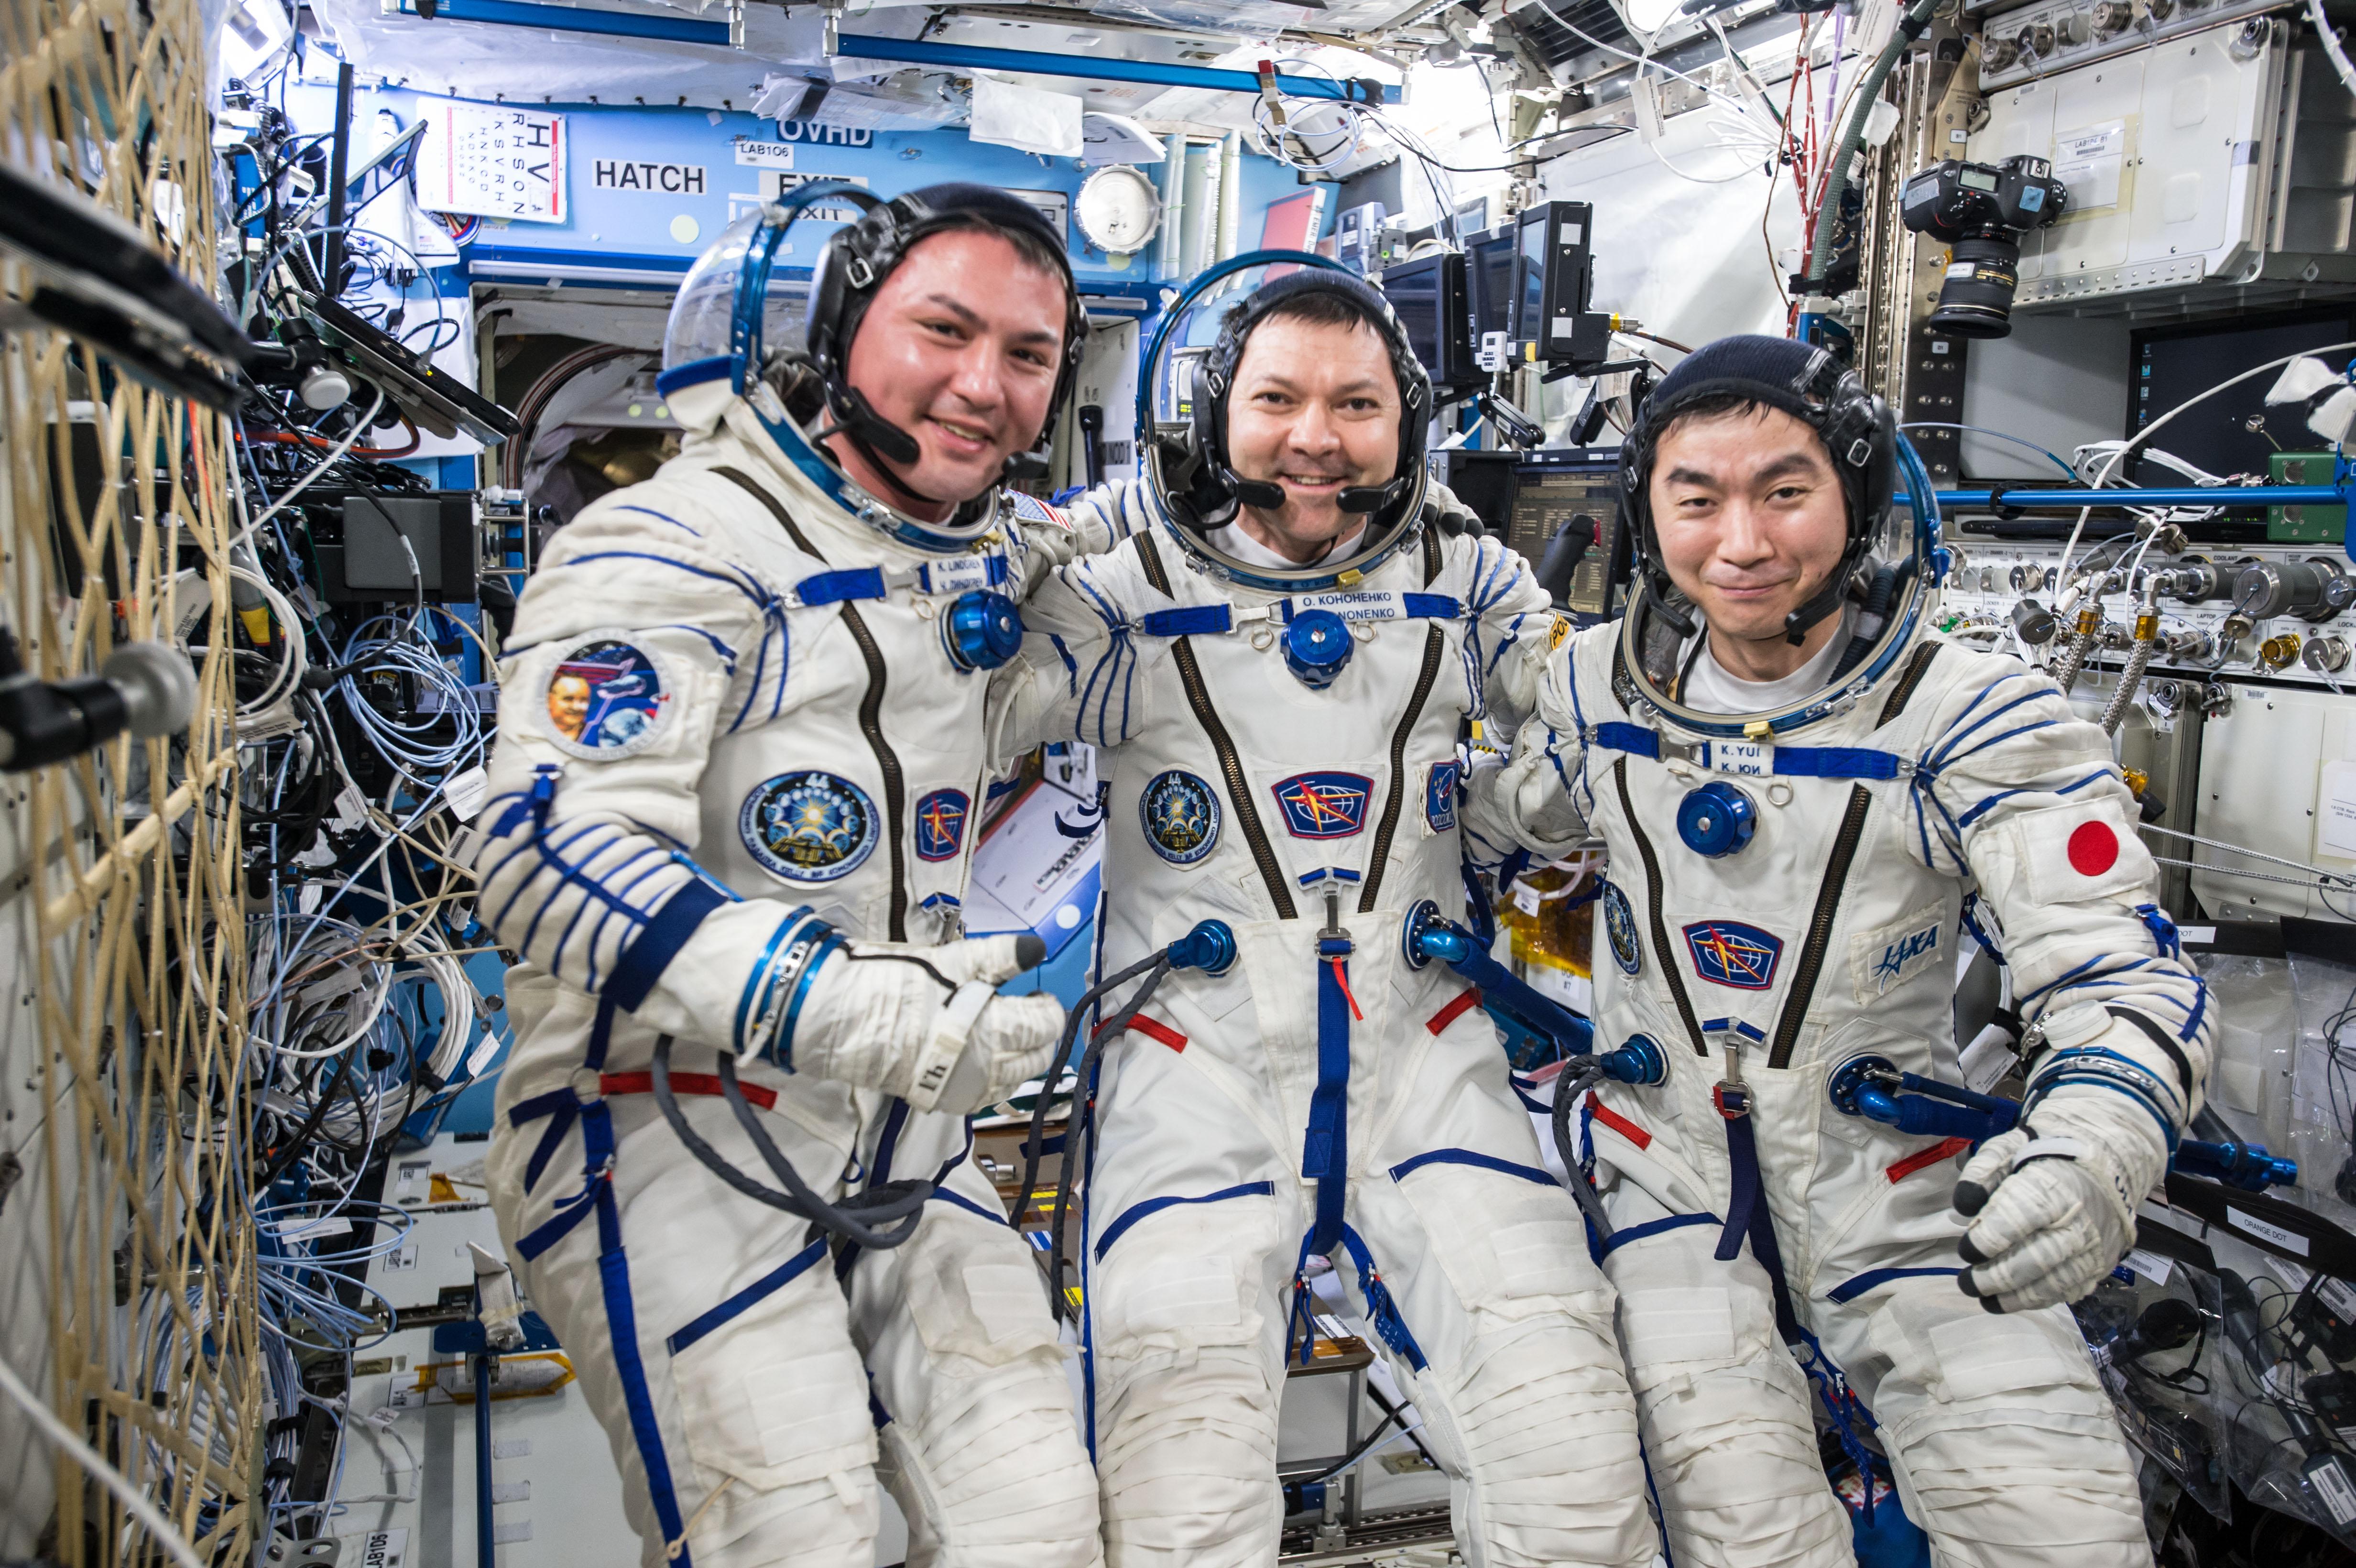 international space station oldest astronaut - photo #42